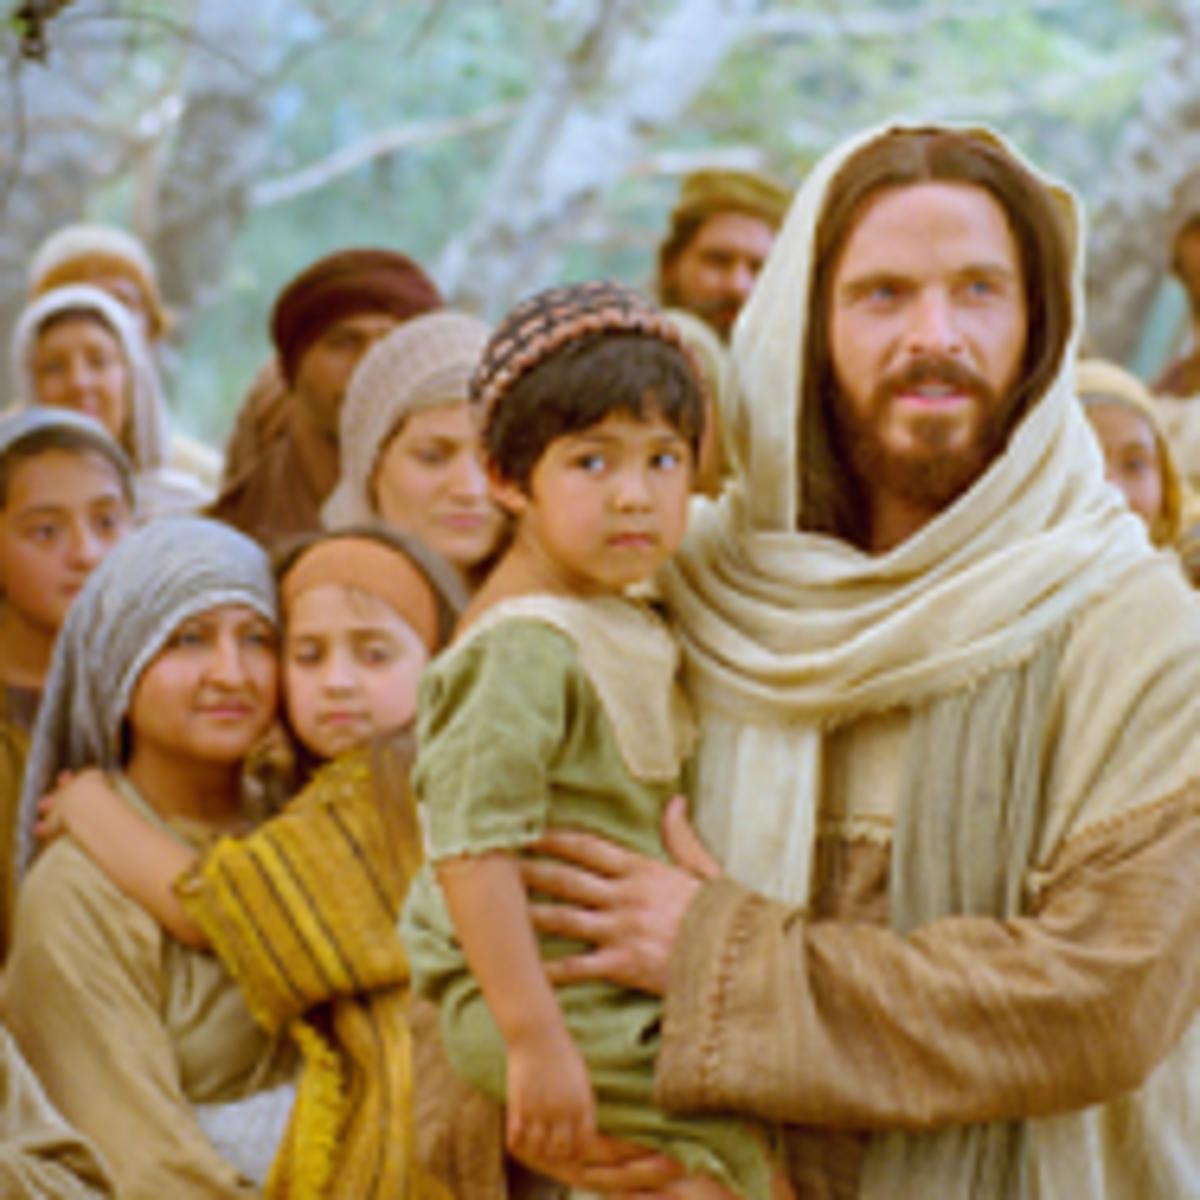 Jesus Christ with the children